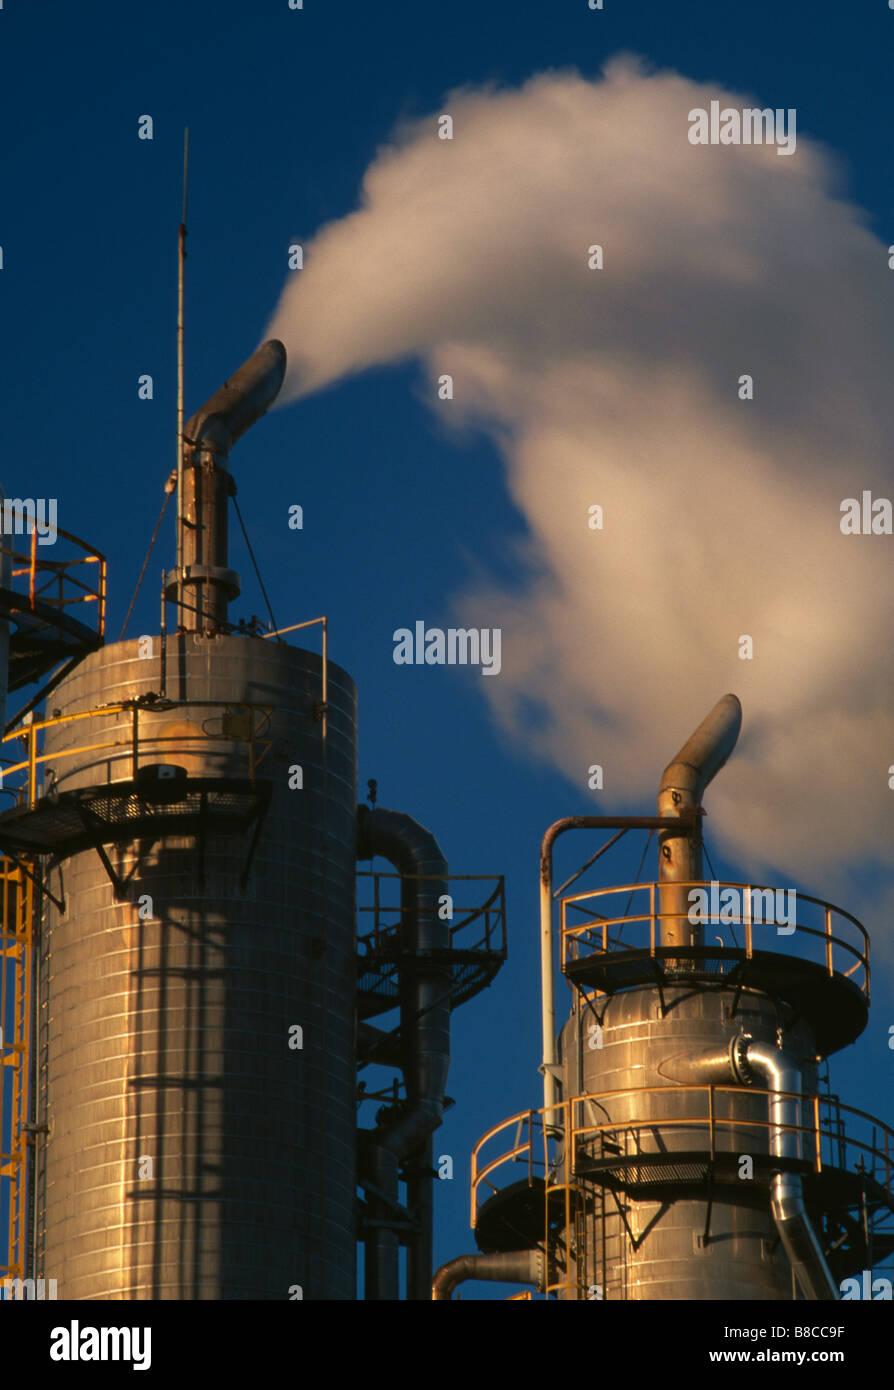 CARBON DIOXIDE EMISSIONS - Stock Image